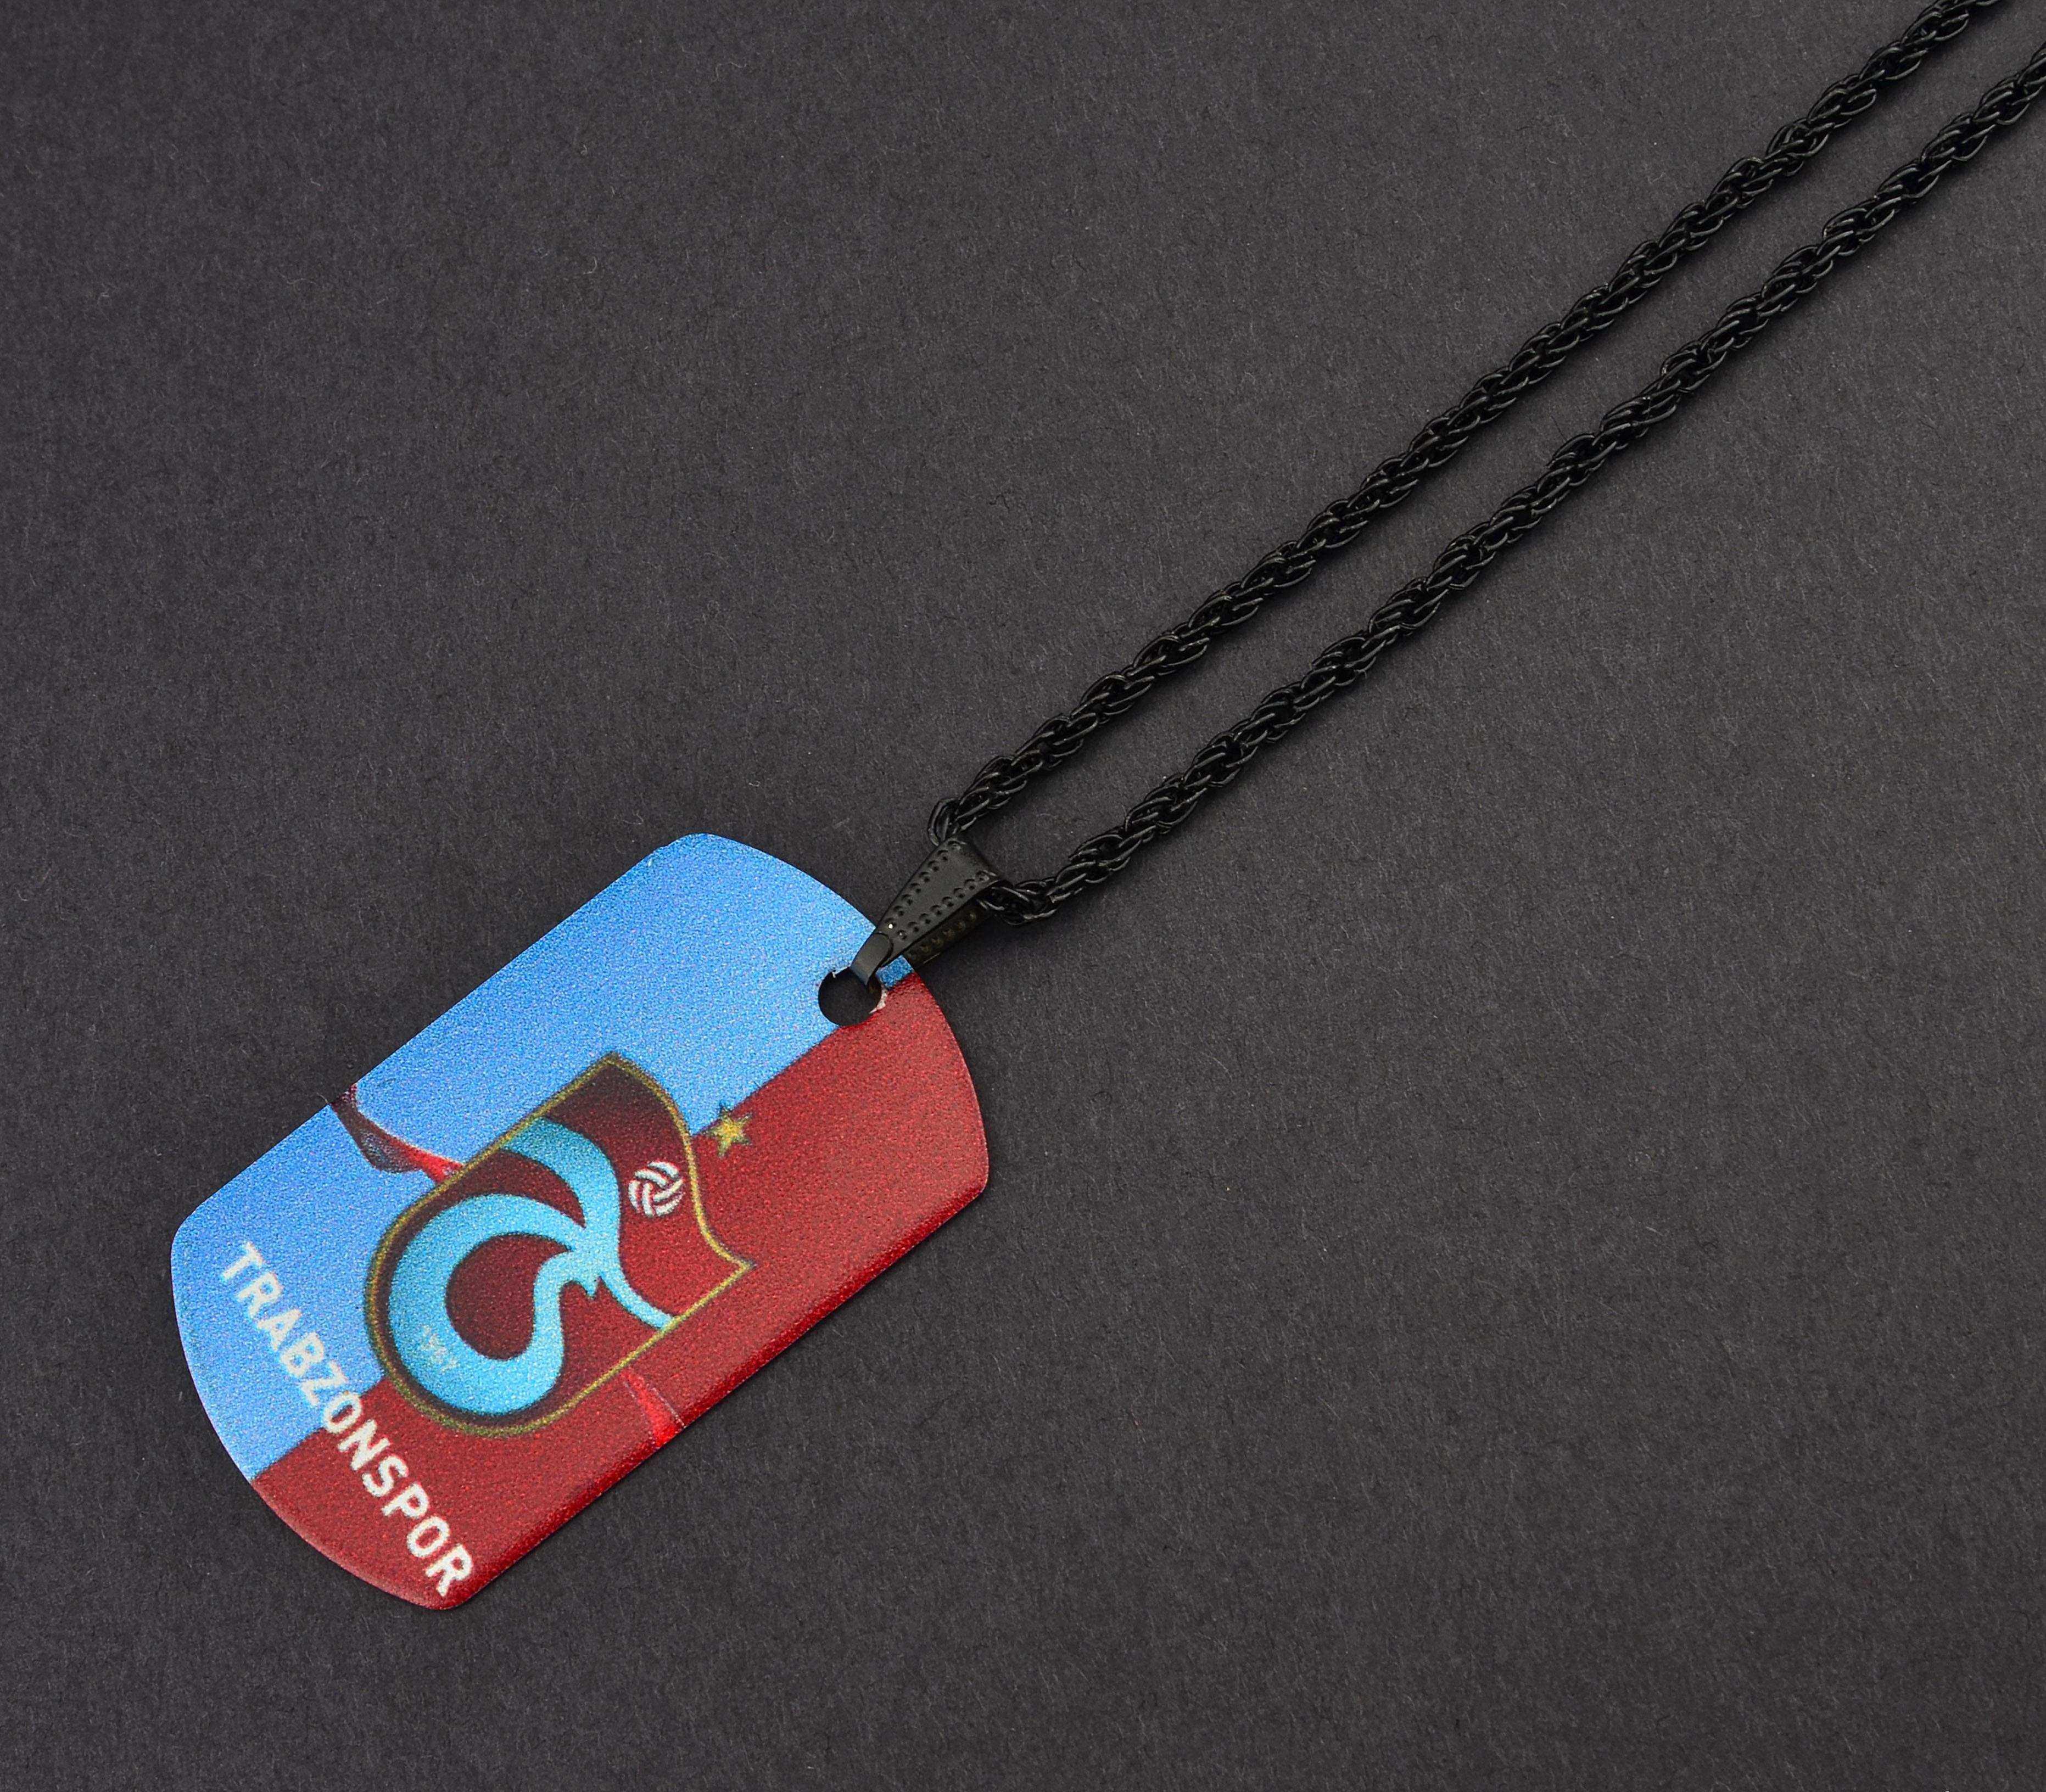 Zincirli Künye Kolye - KOL0283